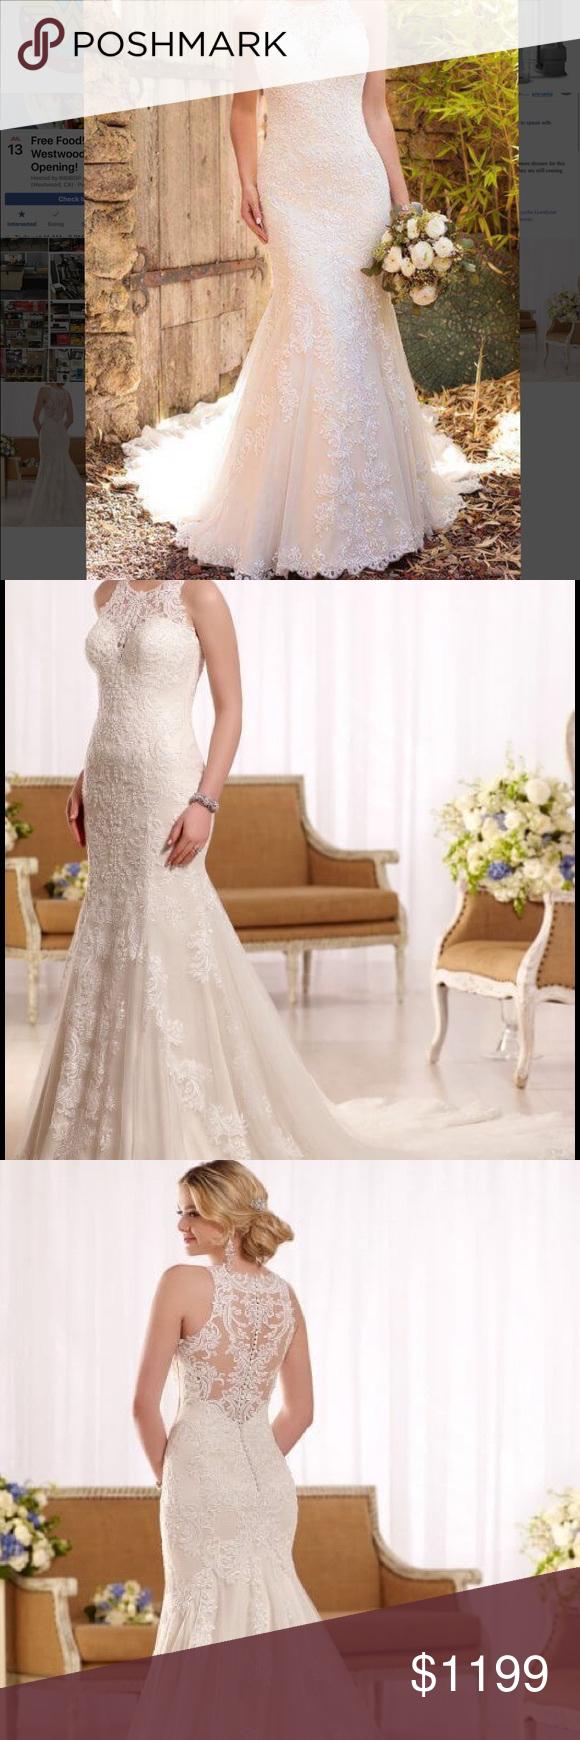 f446f44d426 Essense of Australia D2174 NEW This is a brand new authentic Essense of  Australia Wedding Dress